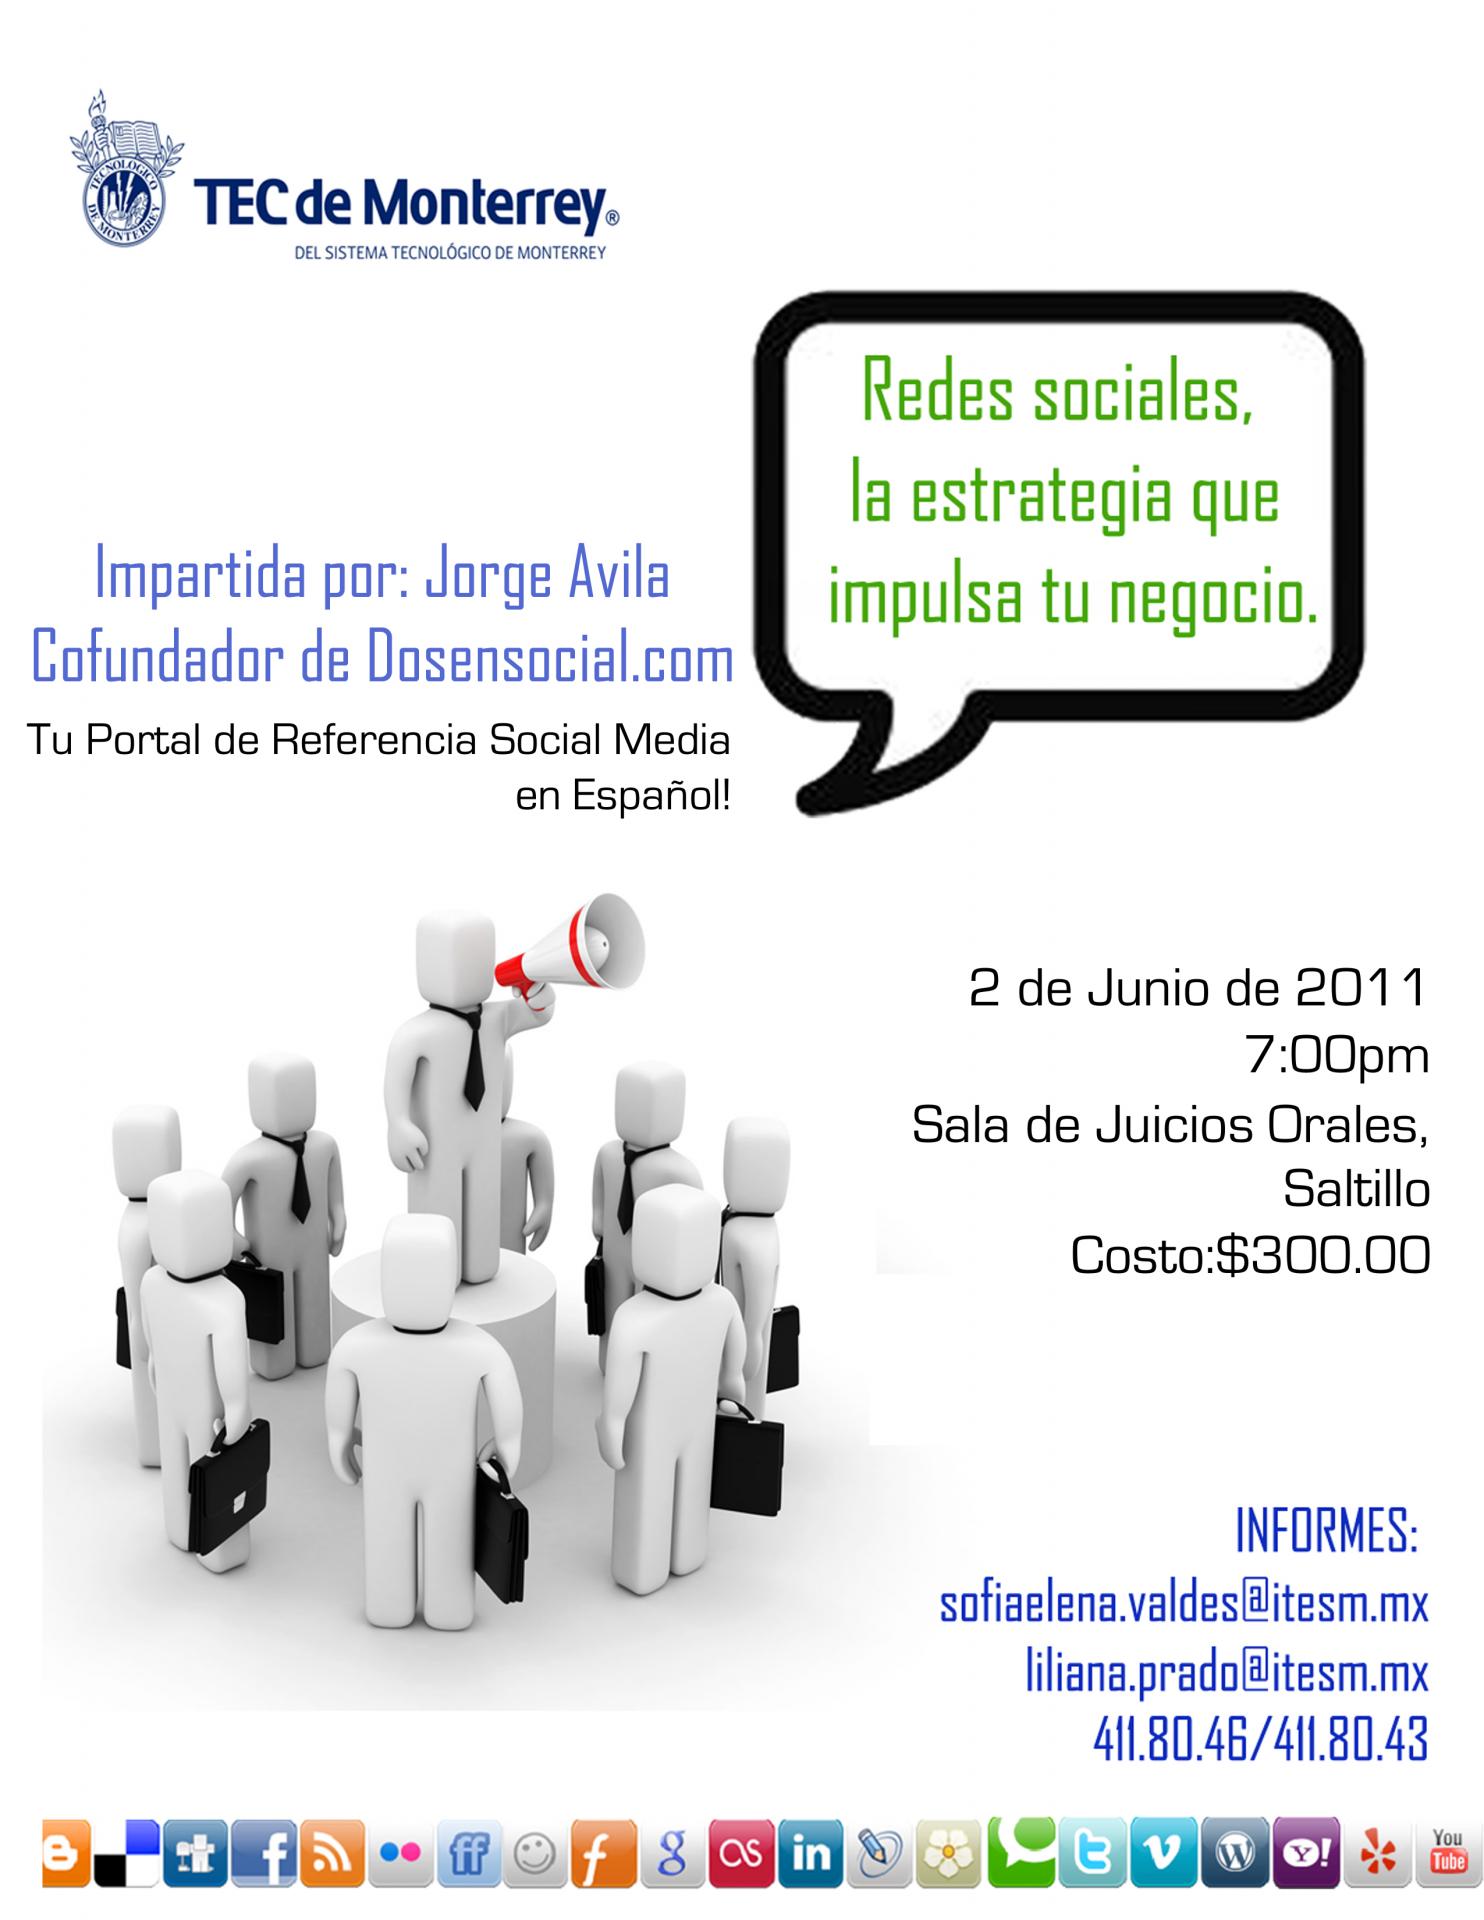 poster_redessociales_negocio-v3.png